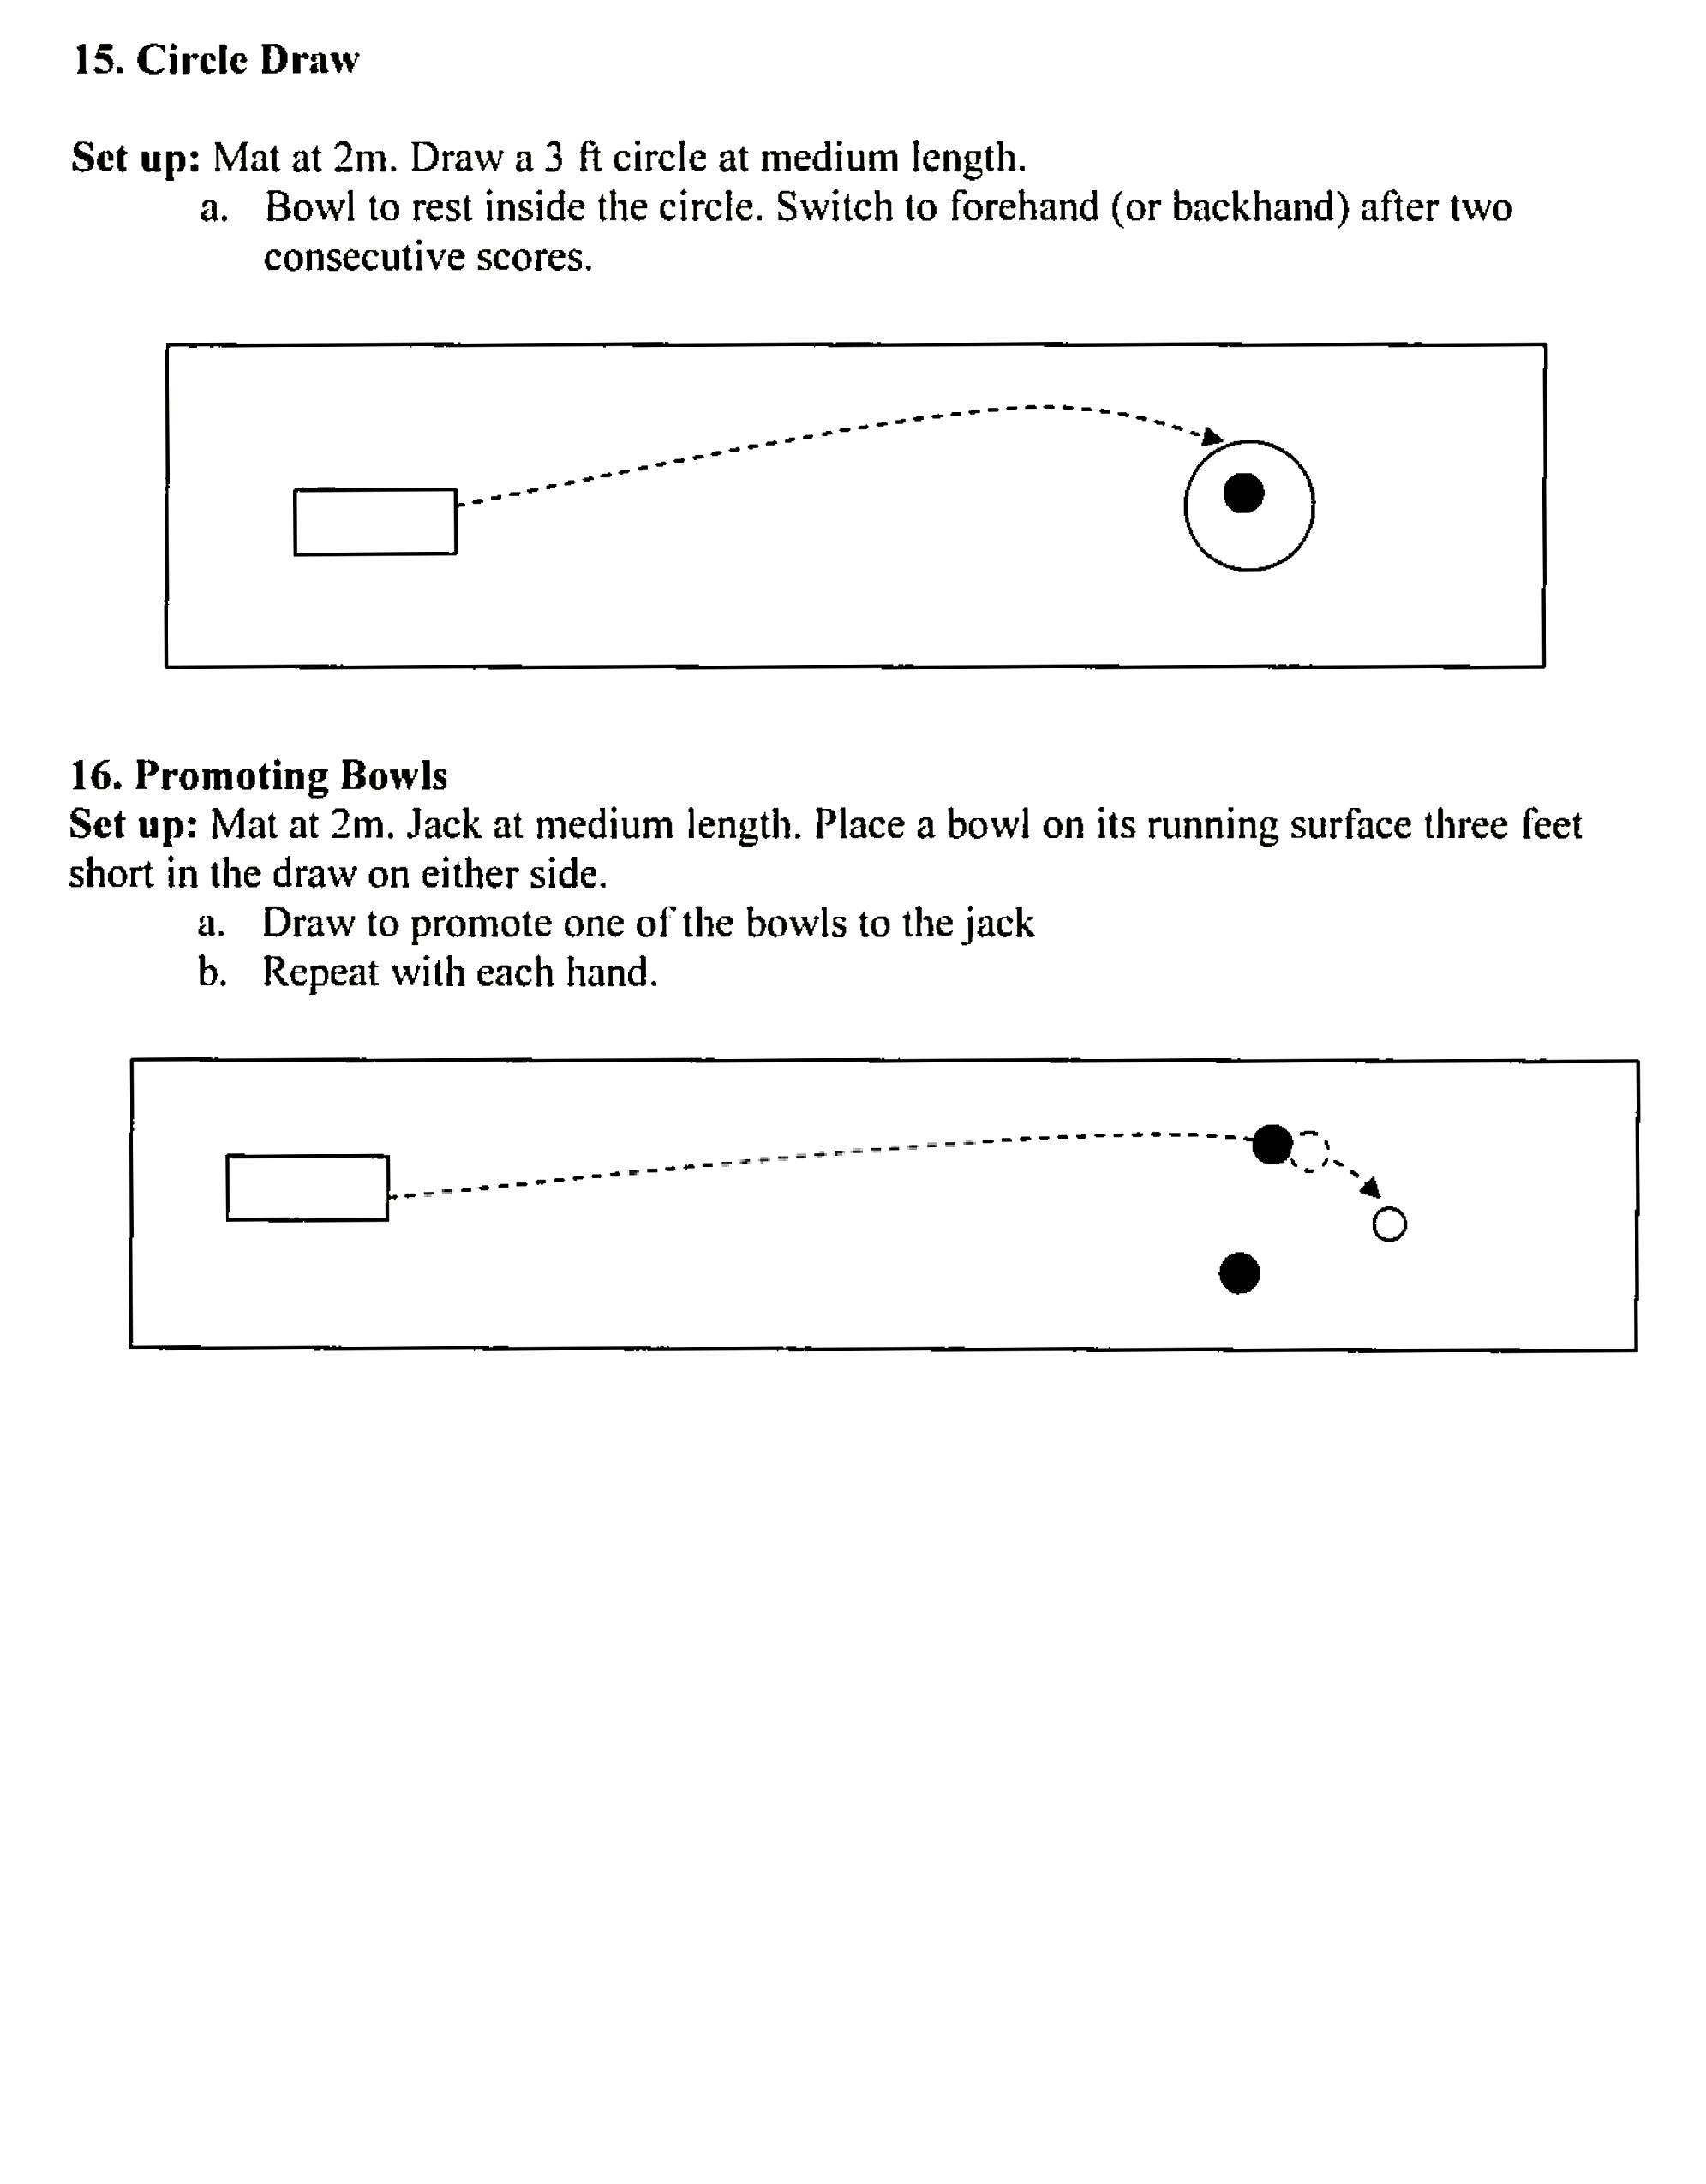 Lawn-Bowling-drills-6.png